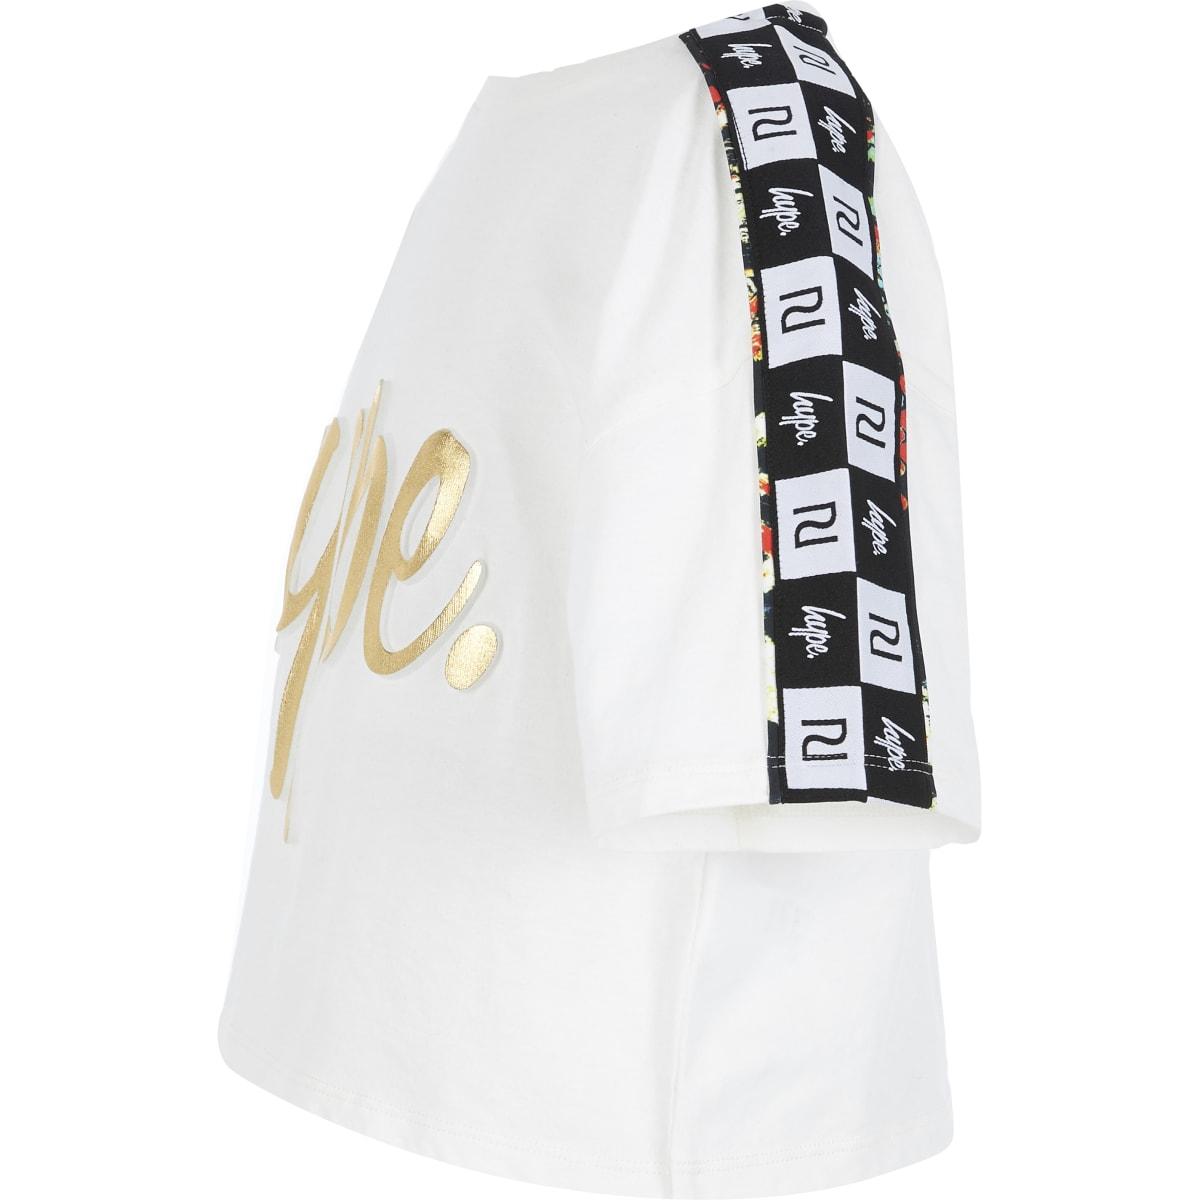 RI x Hype - Wit cropped T-shirtmet bies voor meisjes